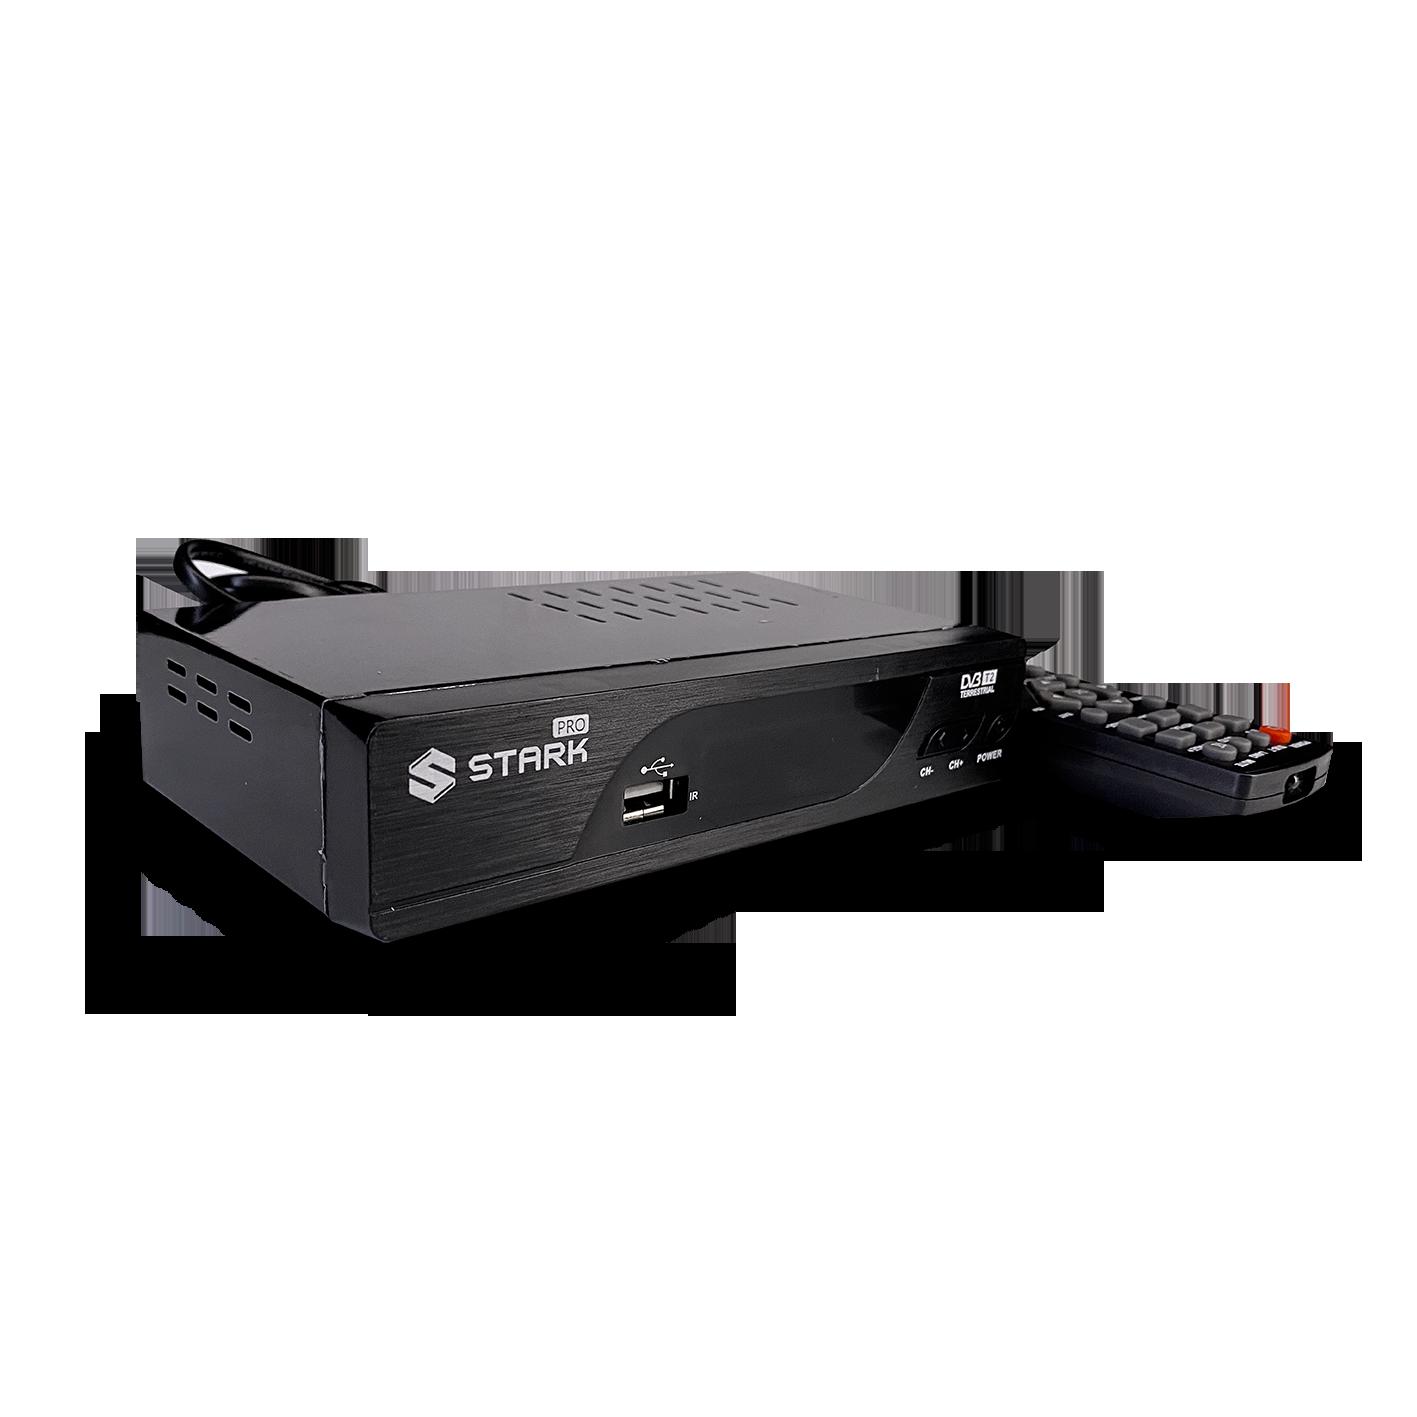 STARK PRO Set Top Box DVB-T2 PVR, teletex, metalno kućište (Slika 4)